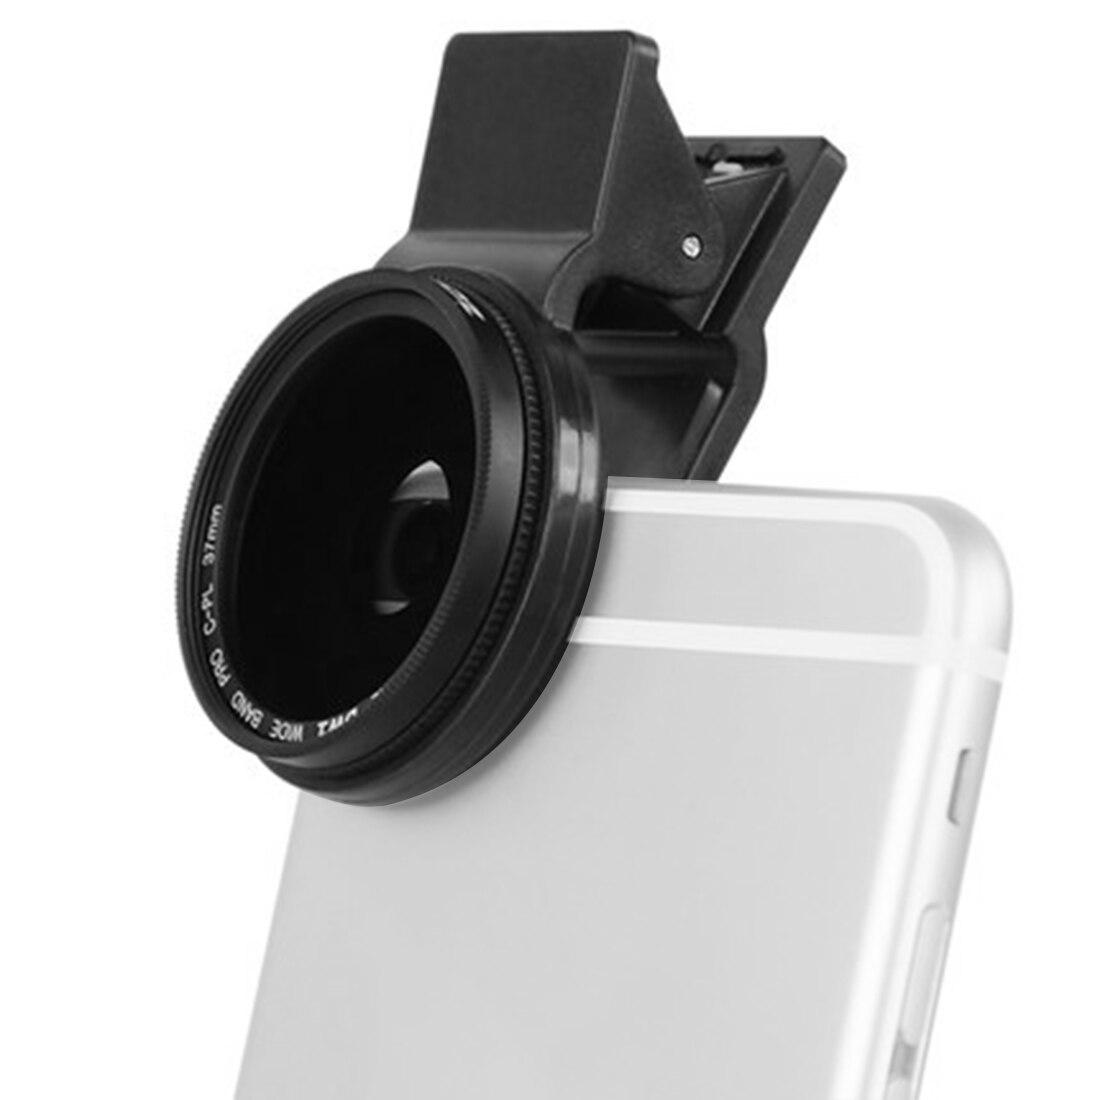 Zomei 37mm câmera do telefone profissional circular polarizador cpl lente para iphone 7 6 s plus samsung galaxy huawei htc windows android